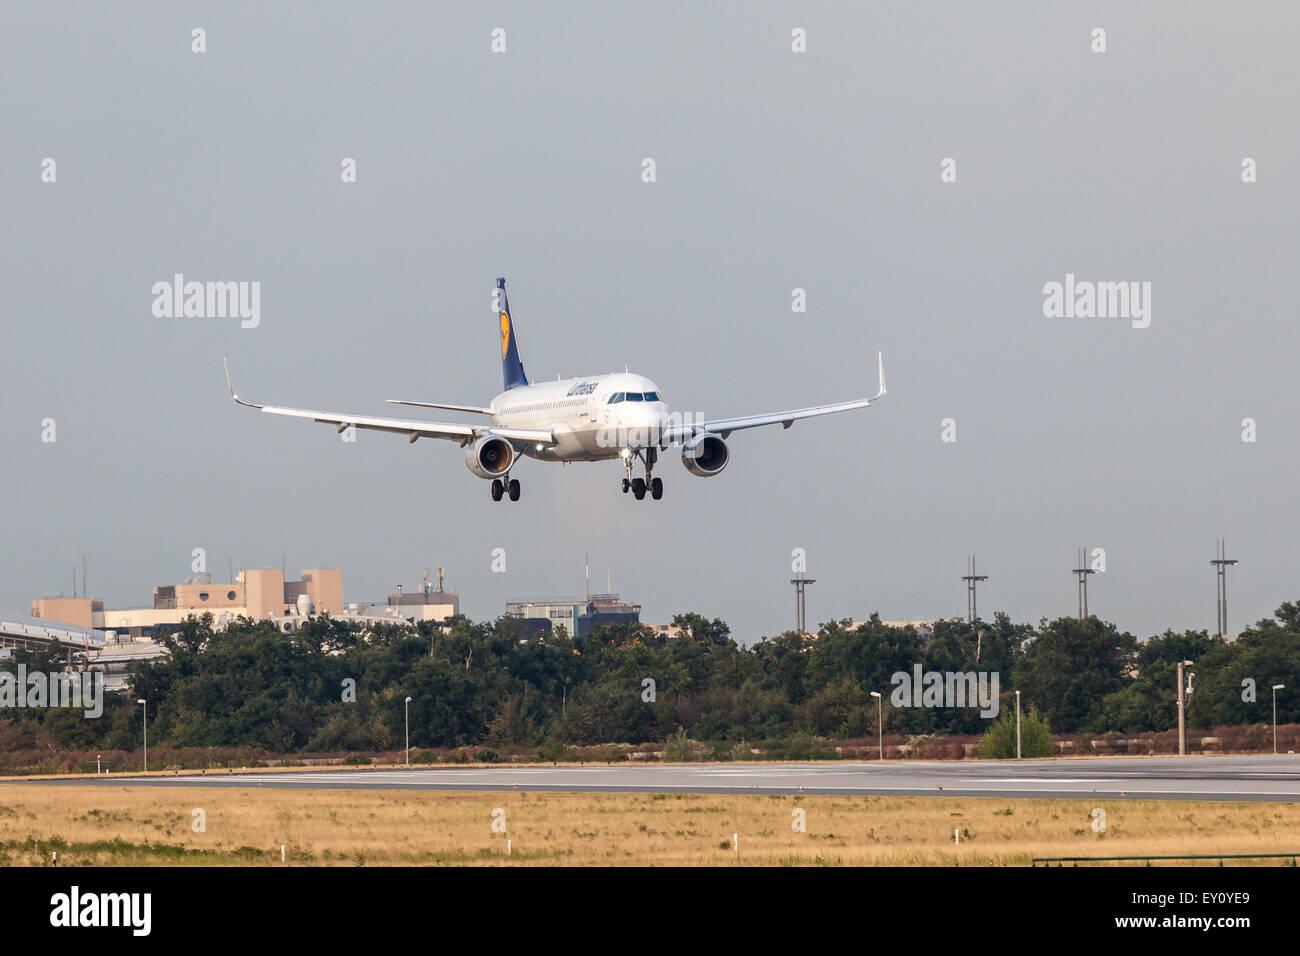 Lufthansa Airbus A320-200 aircraft landing at the Frankfurt International Airport. - Stock Image